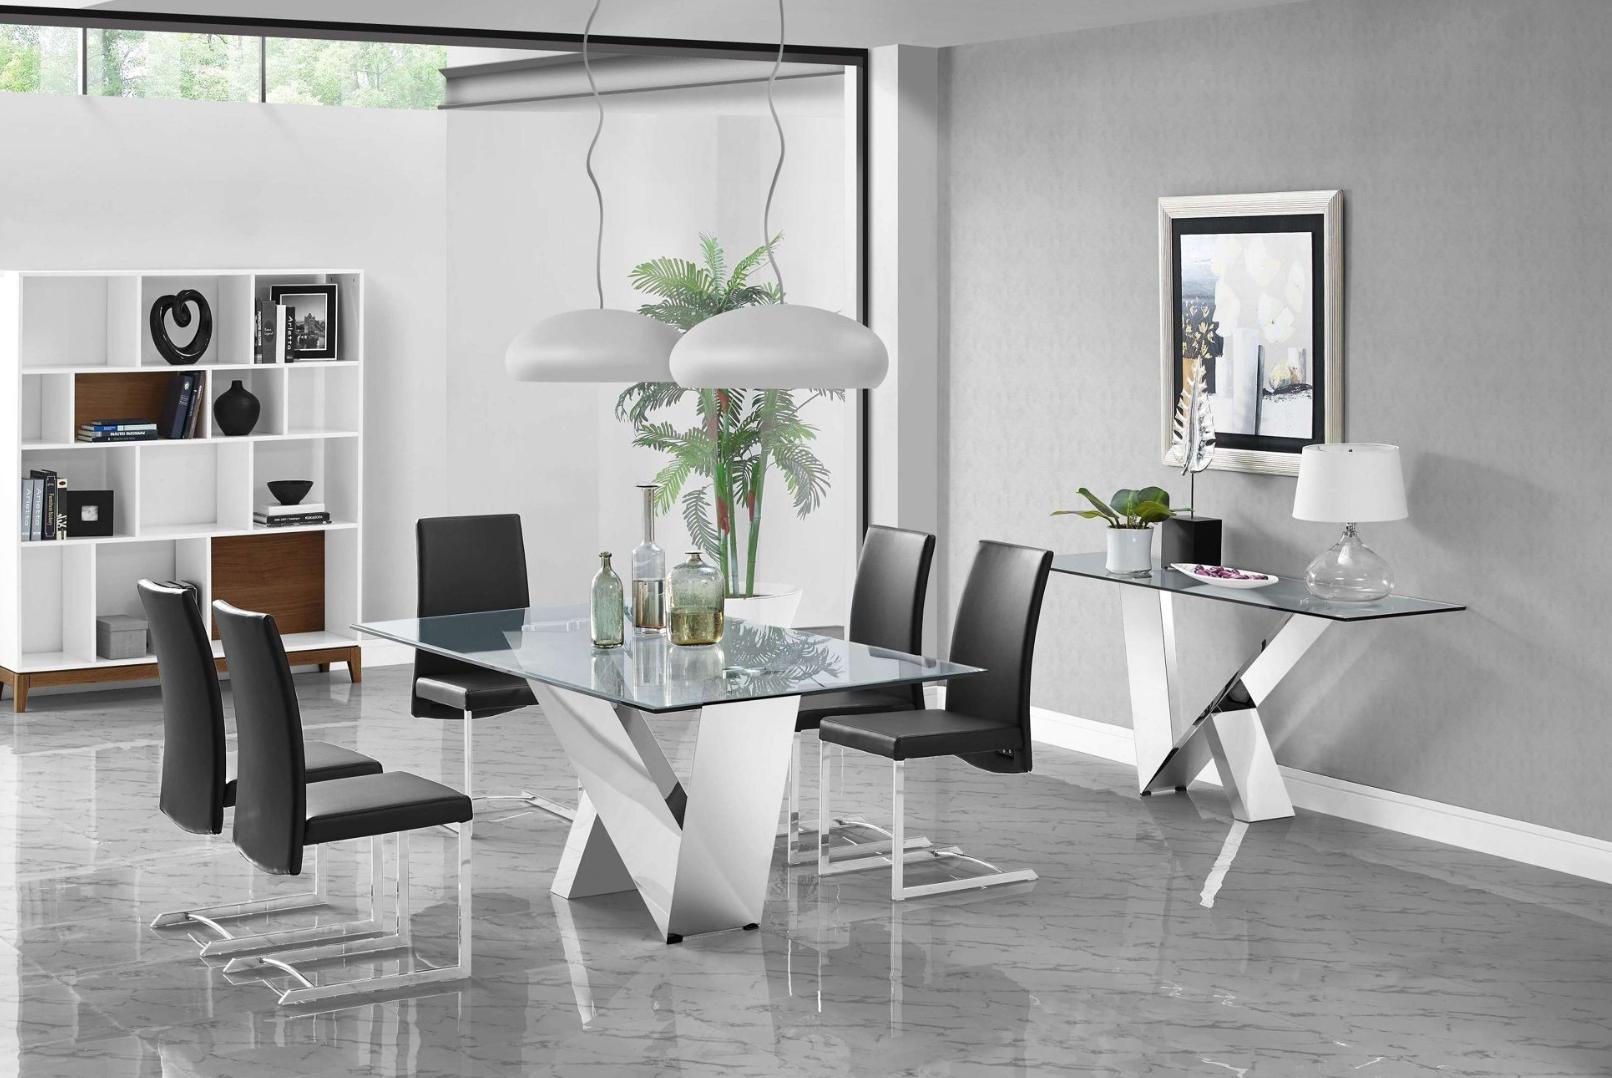 Sirius table by Creative, Creative Furniture USA, Creative Dining ...